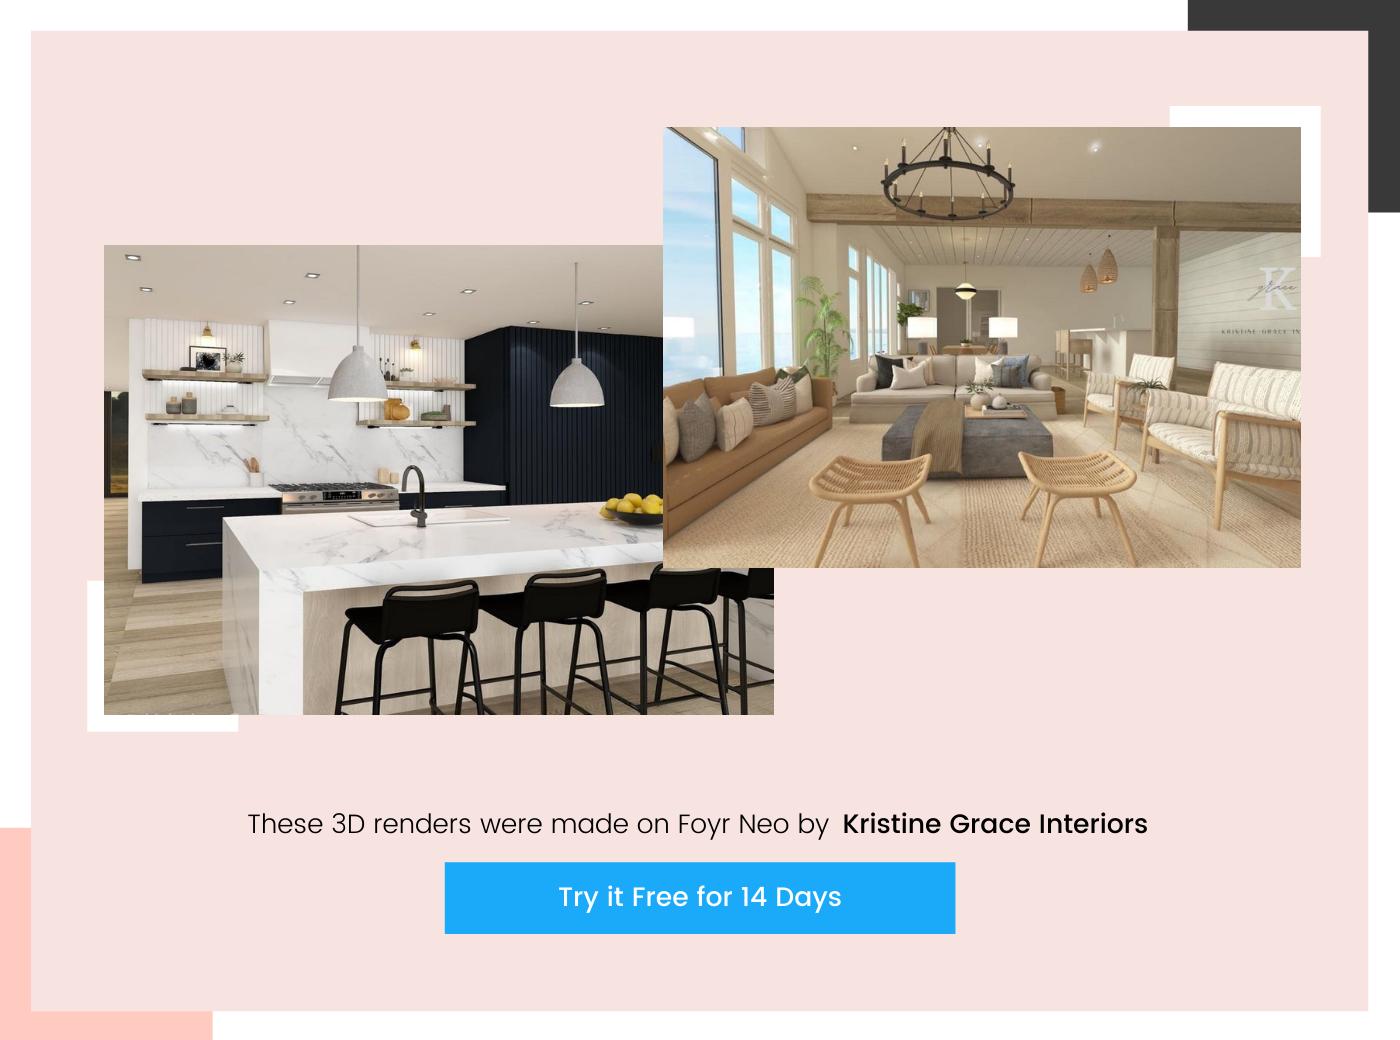 home design by Kristine Grace Interiors